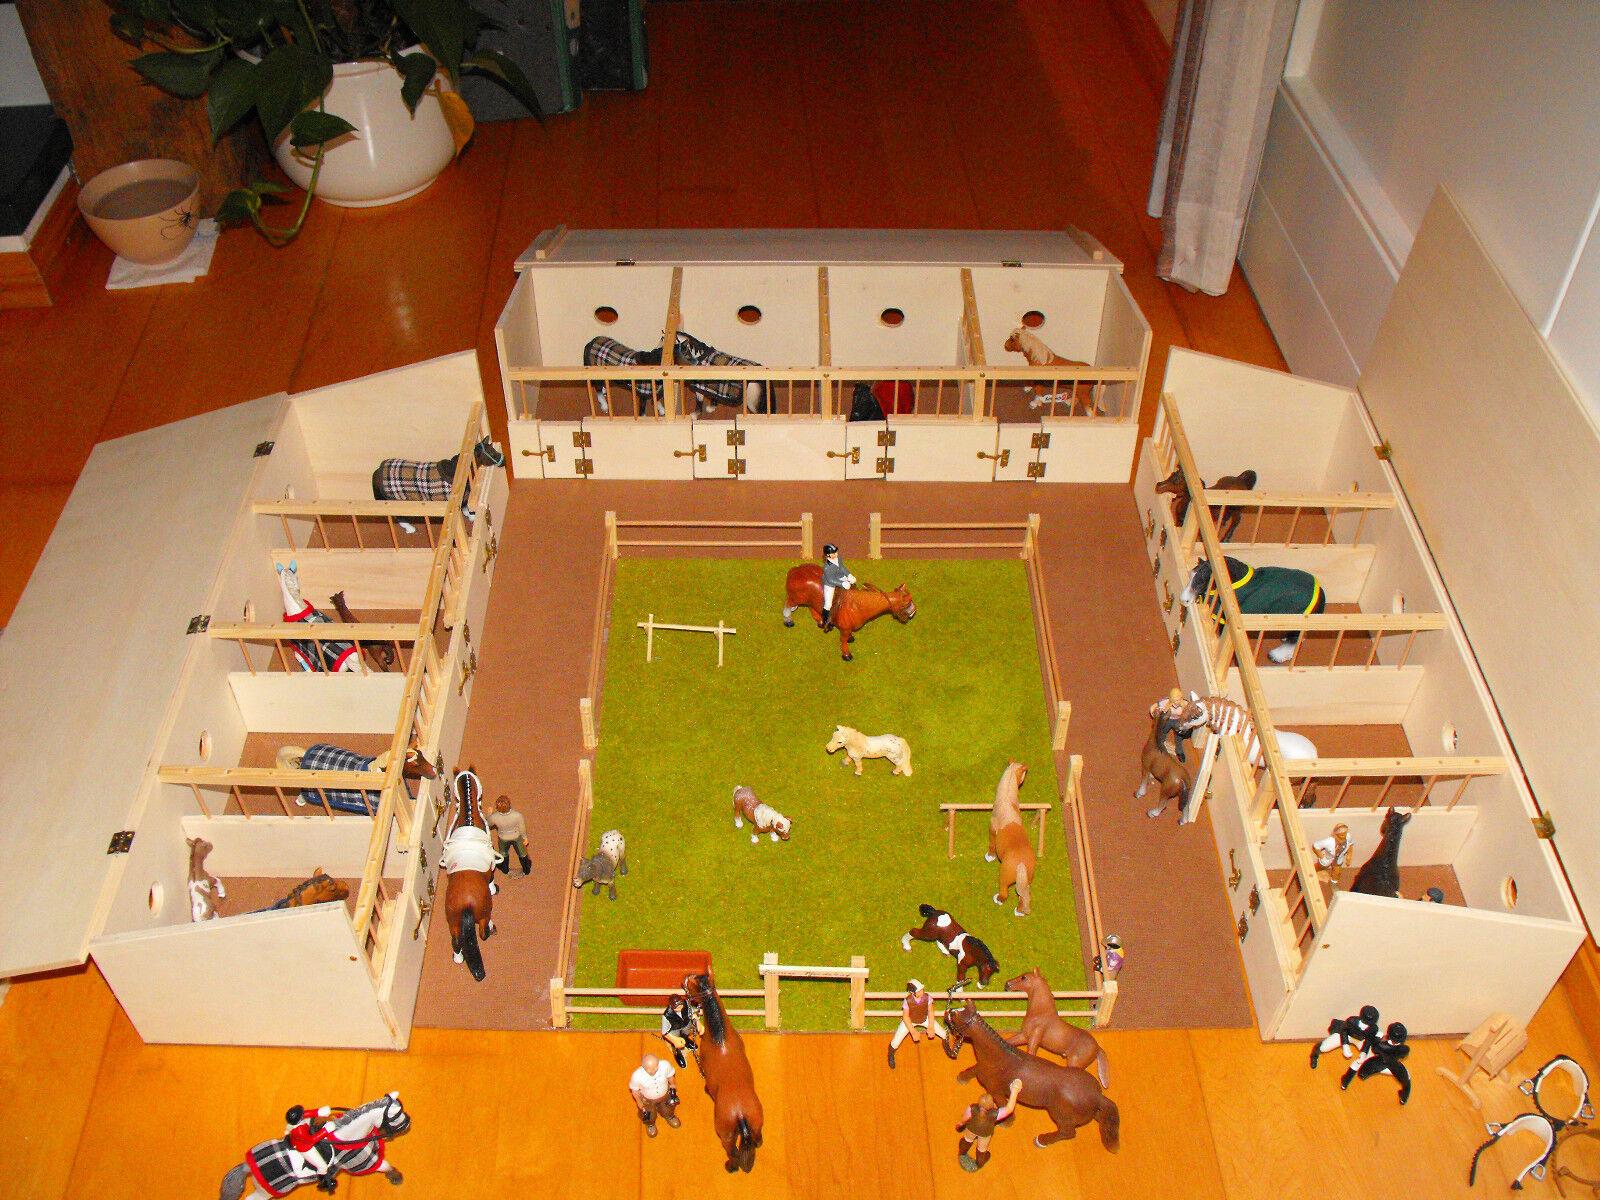 pferdestall pferdeboxen f r u a schleich pferde eigenbau aus holz eur 55 00 picclick de. Black Bedroom Furniture Sets. Home Design Ideas